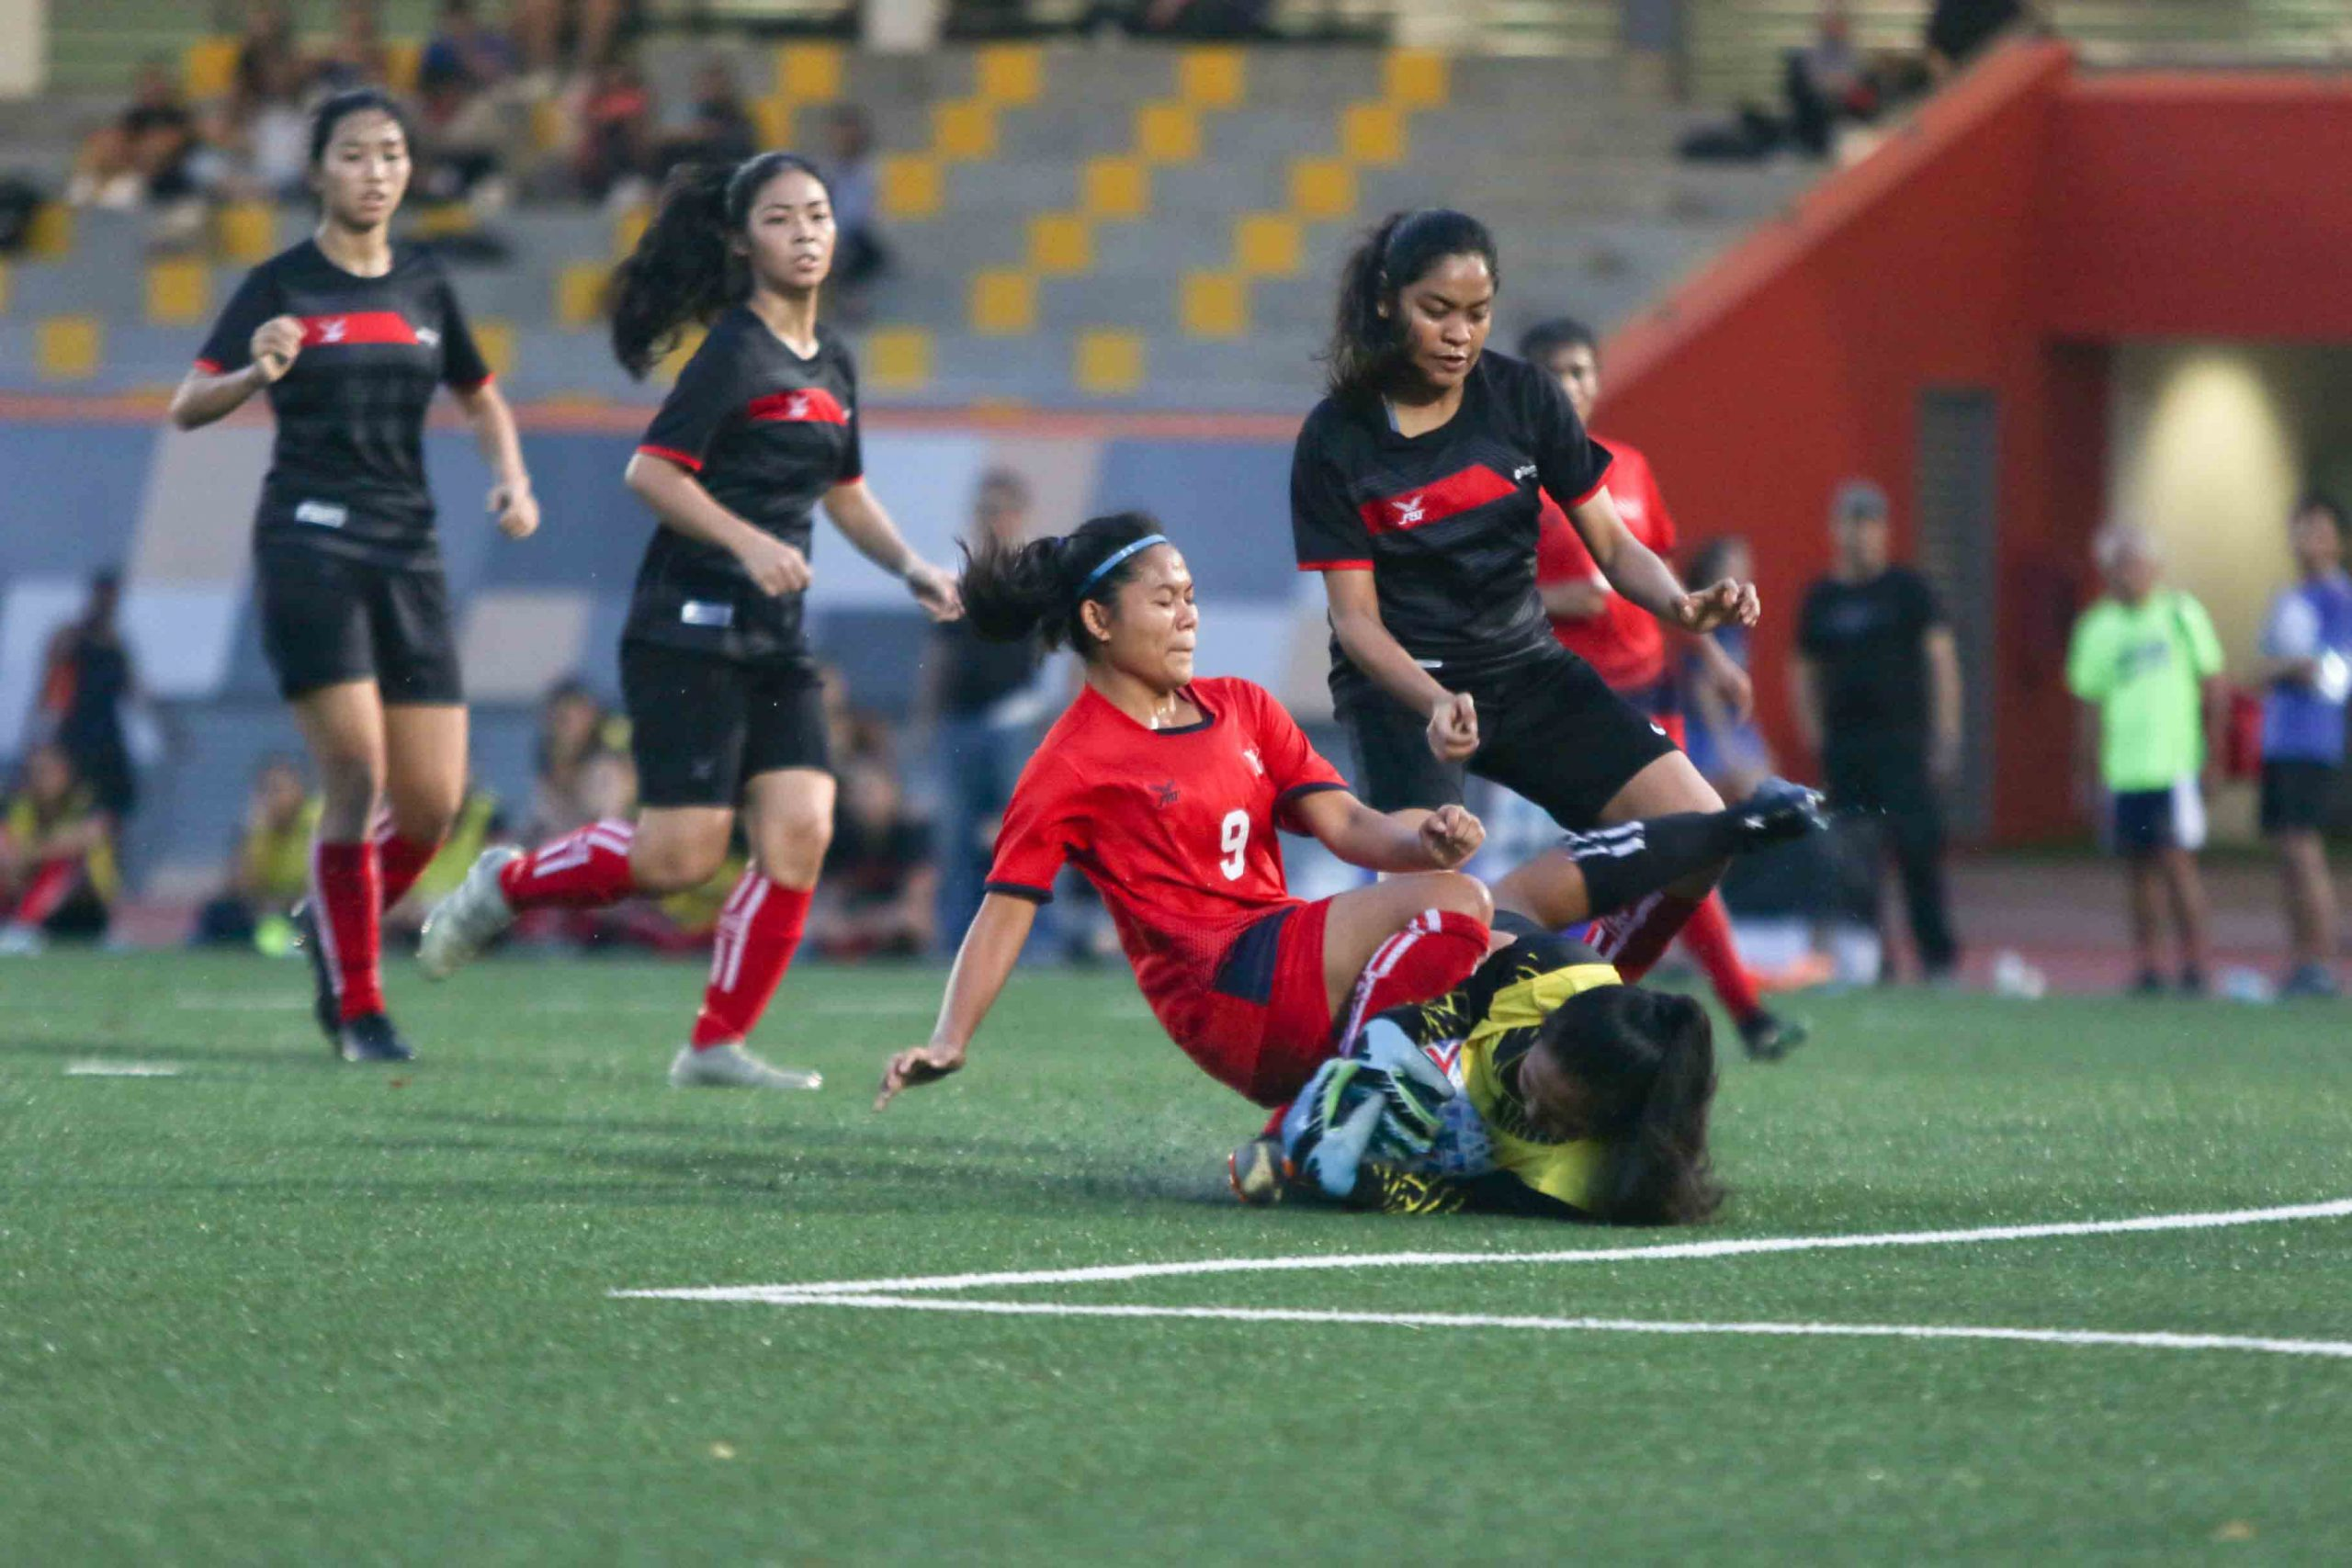 Nur Shaahidah (NYP #9) and Nurul Faizah (TP #1) collide in the box. (Photo 2 © Clara Lau/Red Sports)